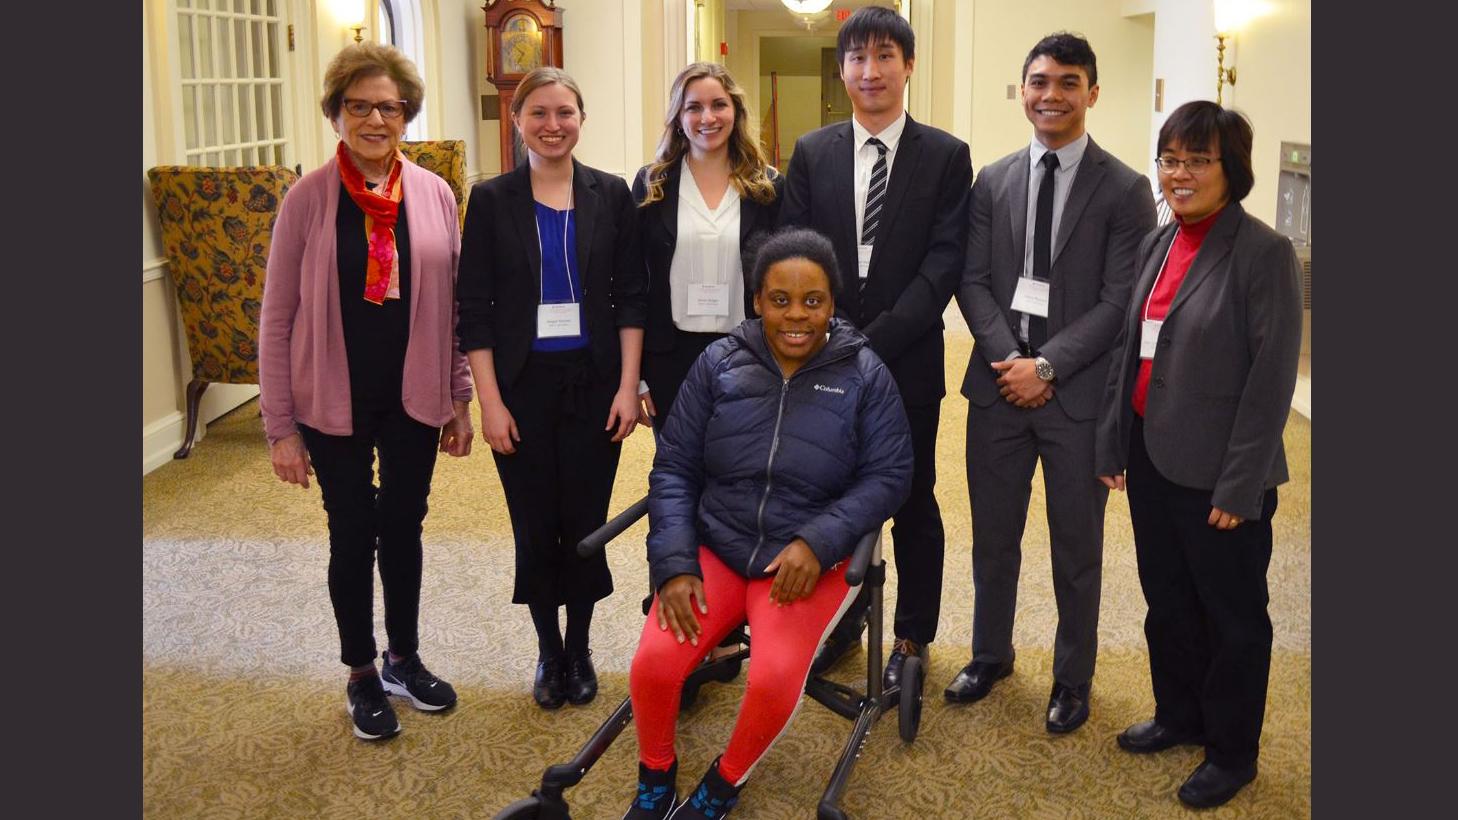 Front: Jasmine Brown. Back (from left): Diane Gottheil, Abigail Steimel, Jamie Sergay, Sung Jae Hwang, Adam Rosales, and Professor Elizabeth Hsiao-Wecksler.